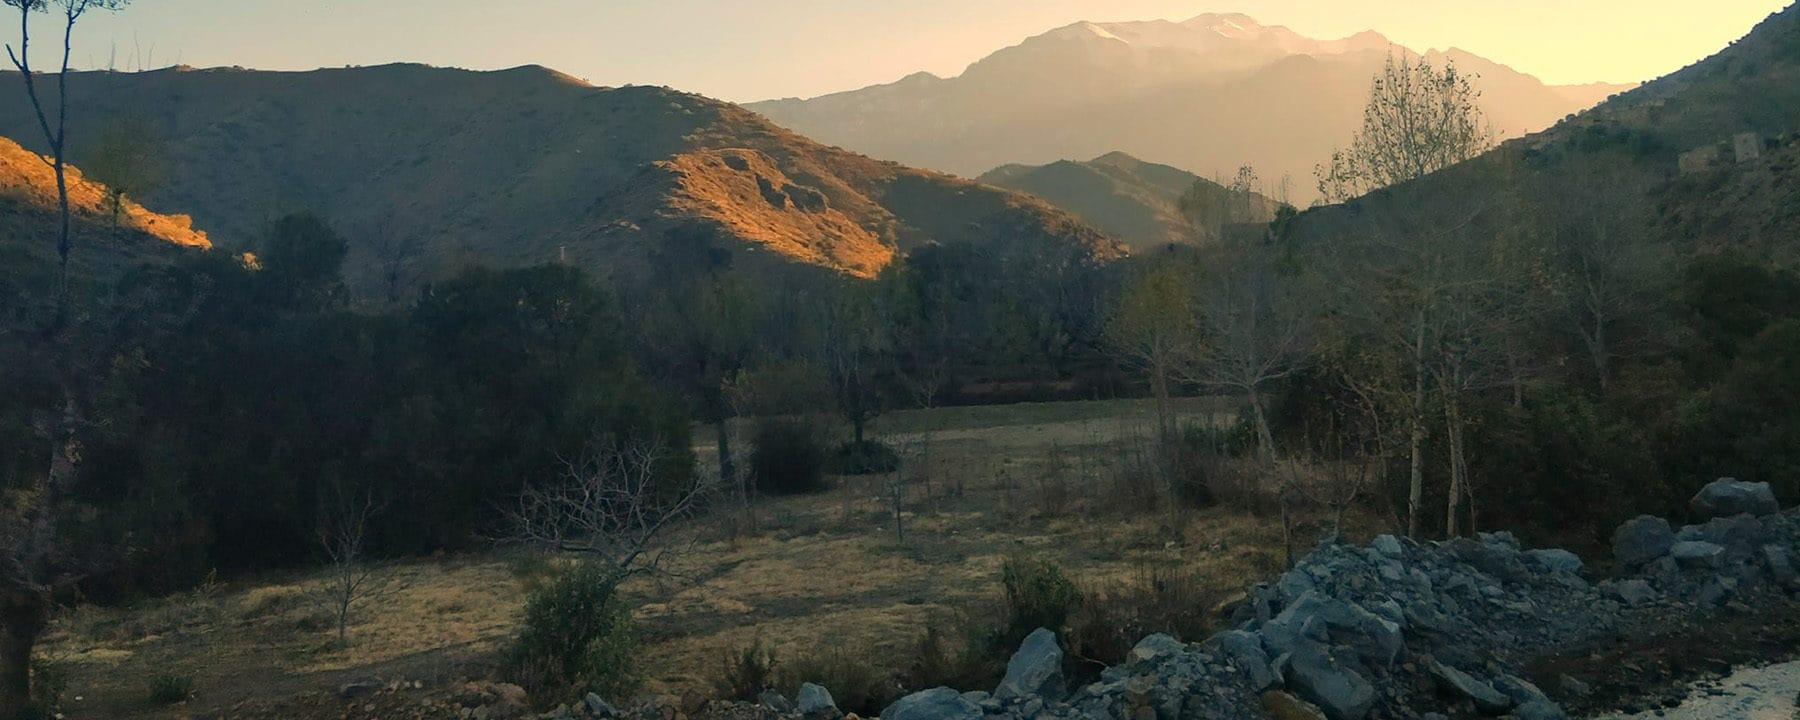 atlas-mountains-yoga-hiking-retreat_source-nosade